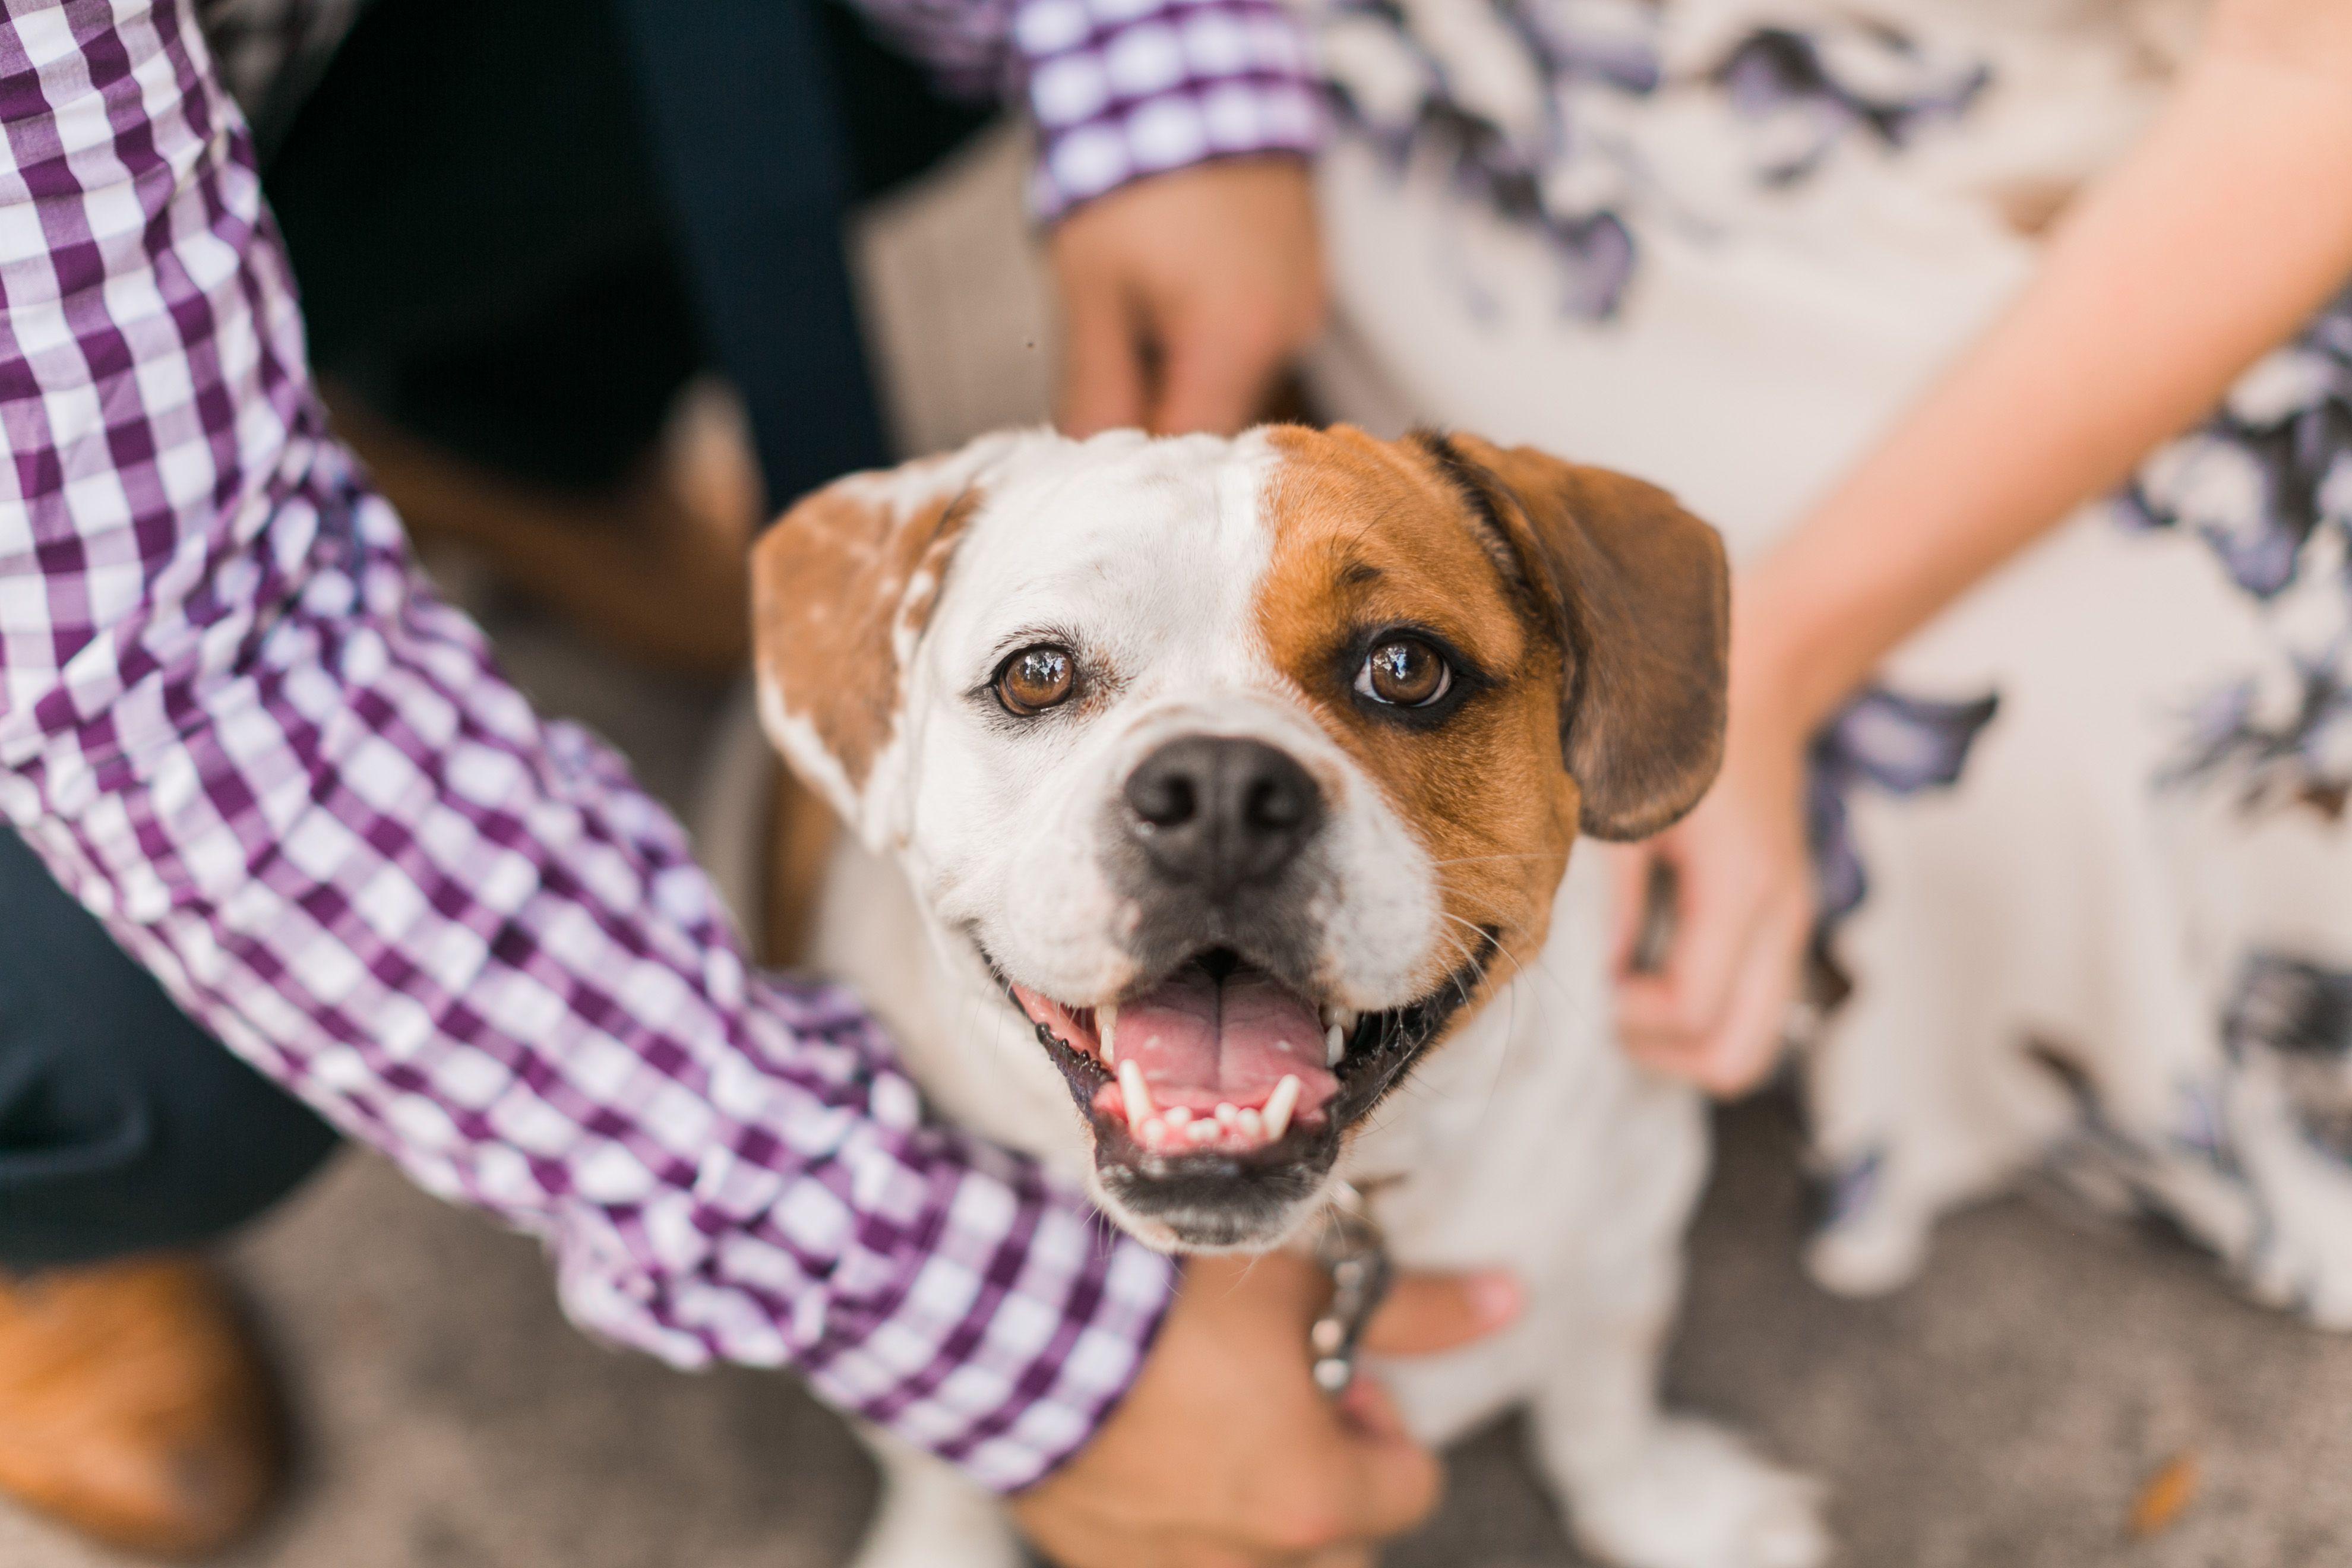 Ramis The Beabull Engagement Photo Puppy Puppydog Dog Cutedog